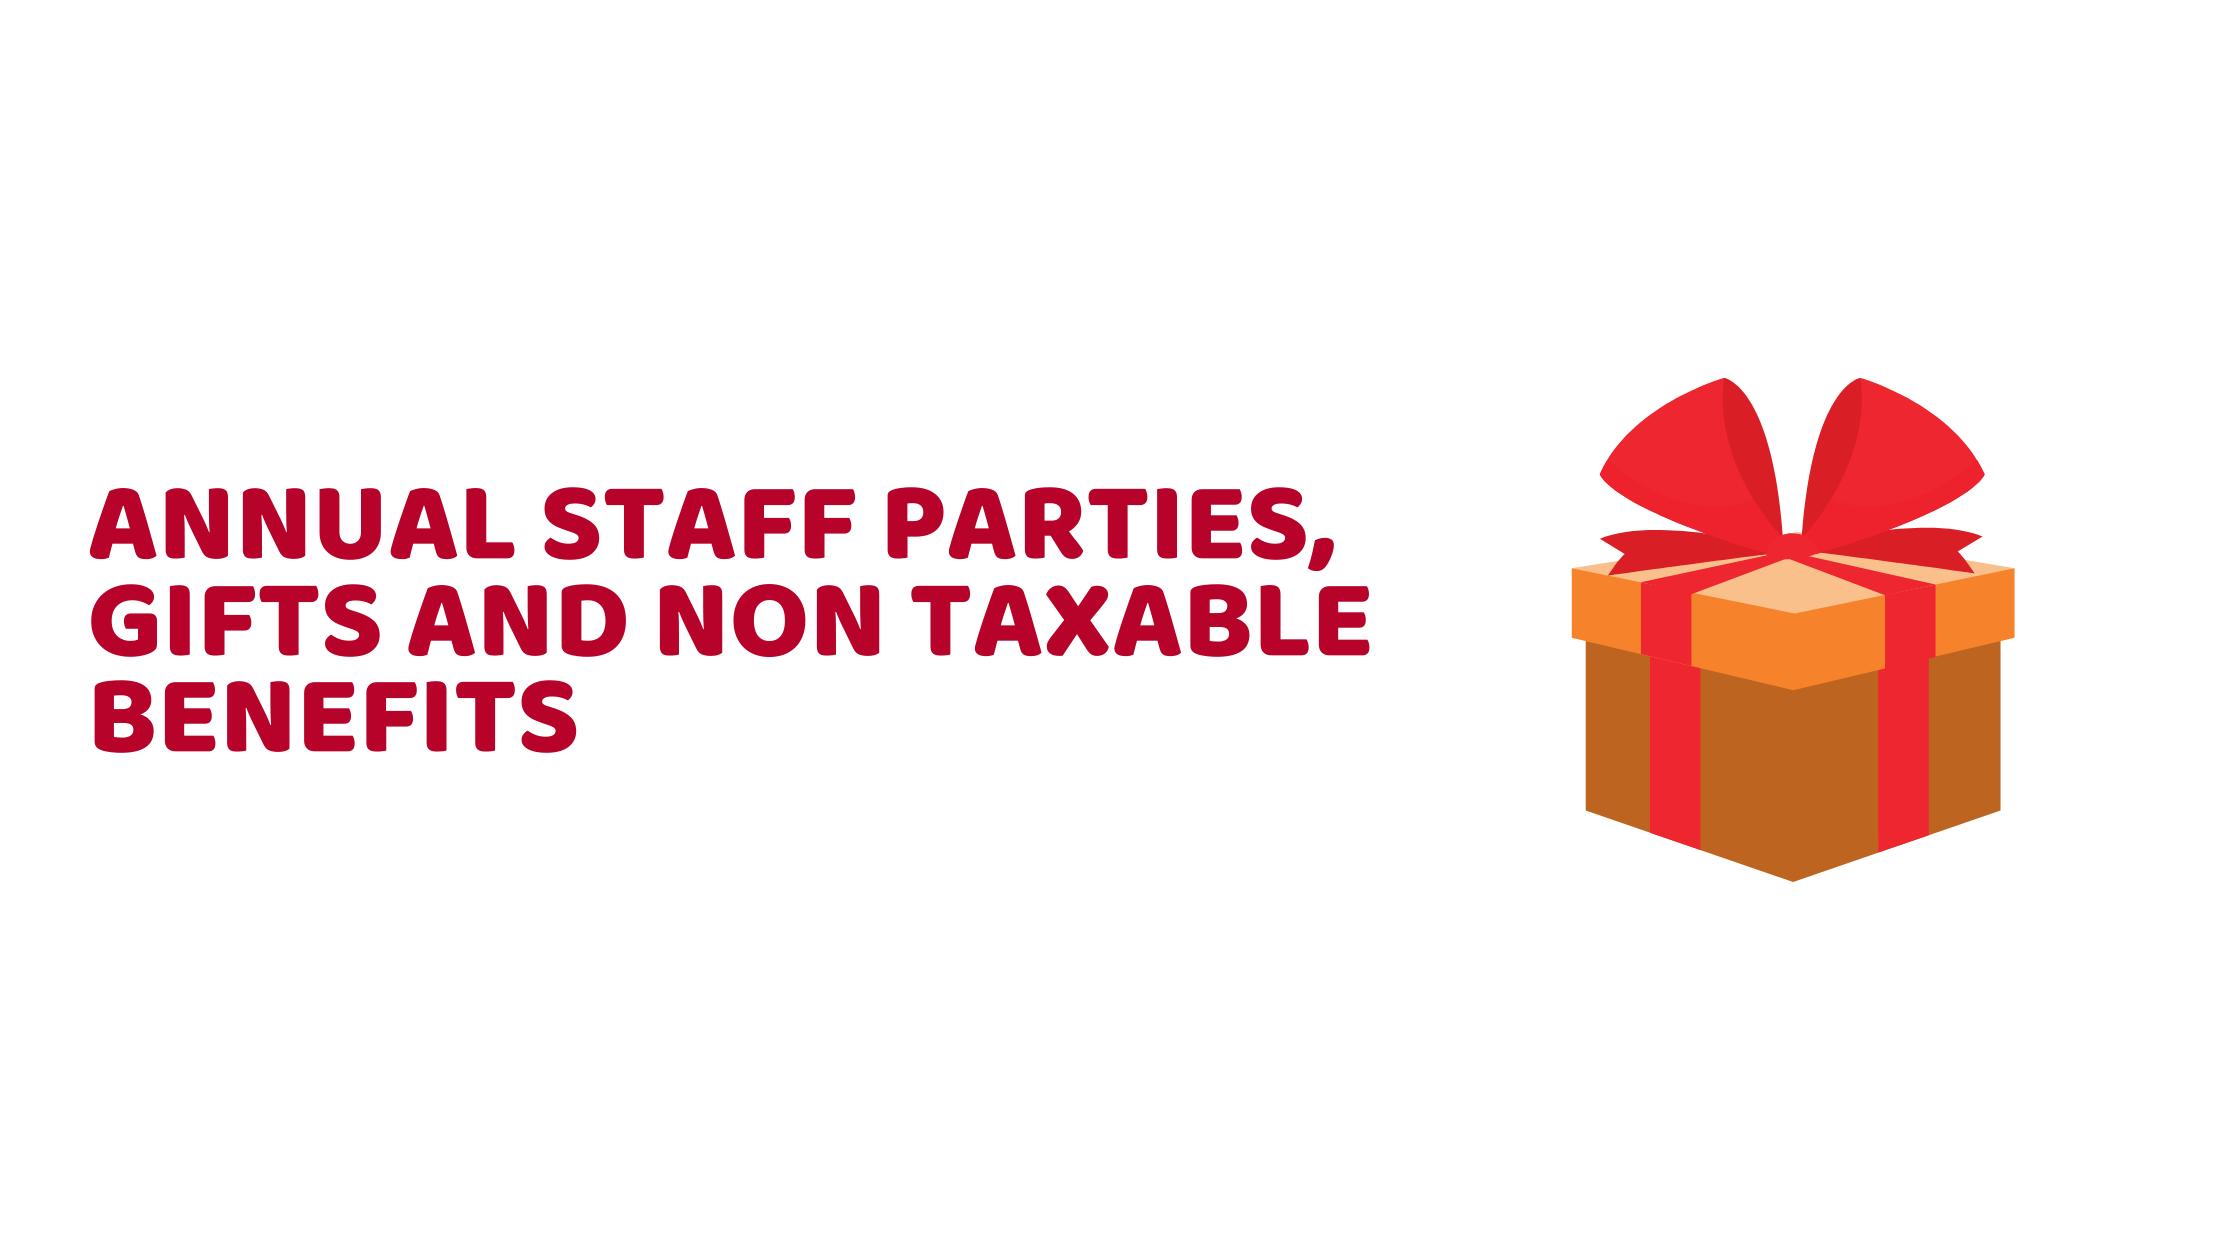 non taxable benefits